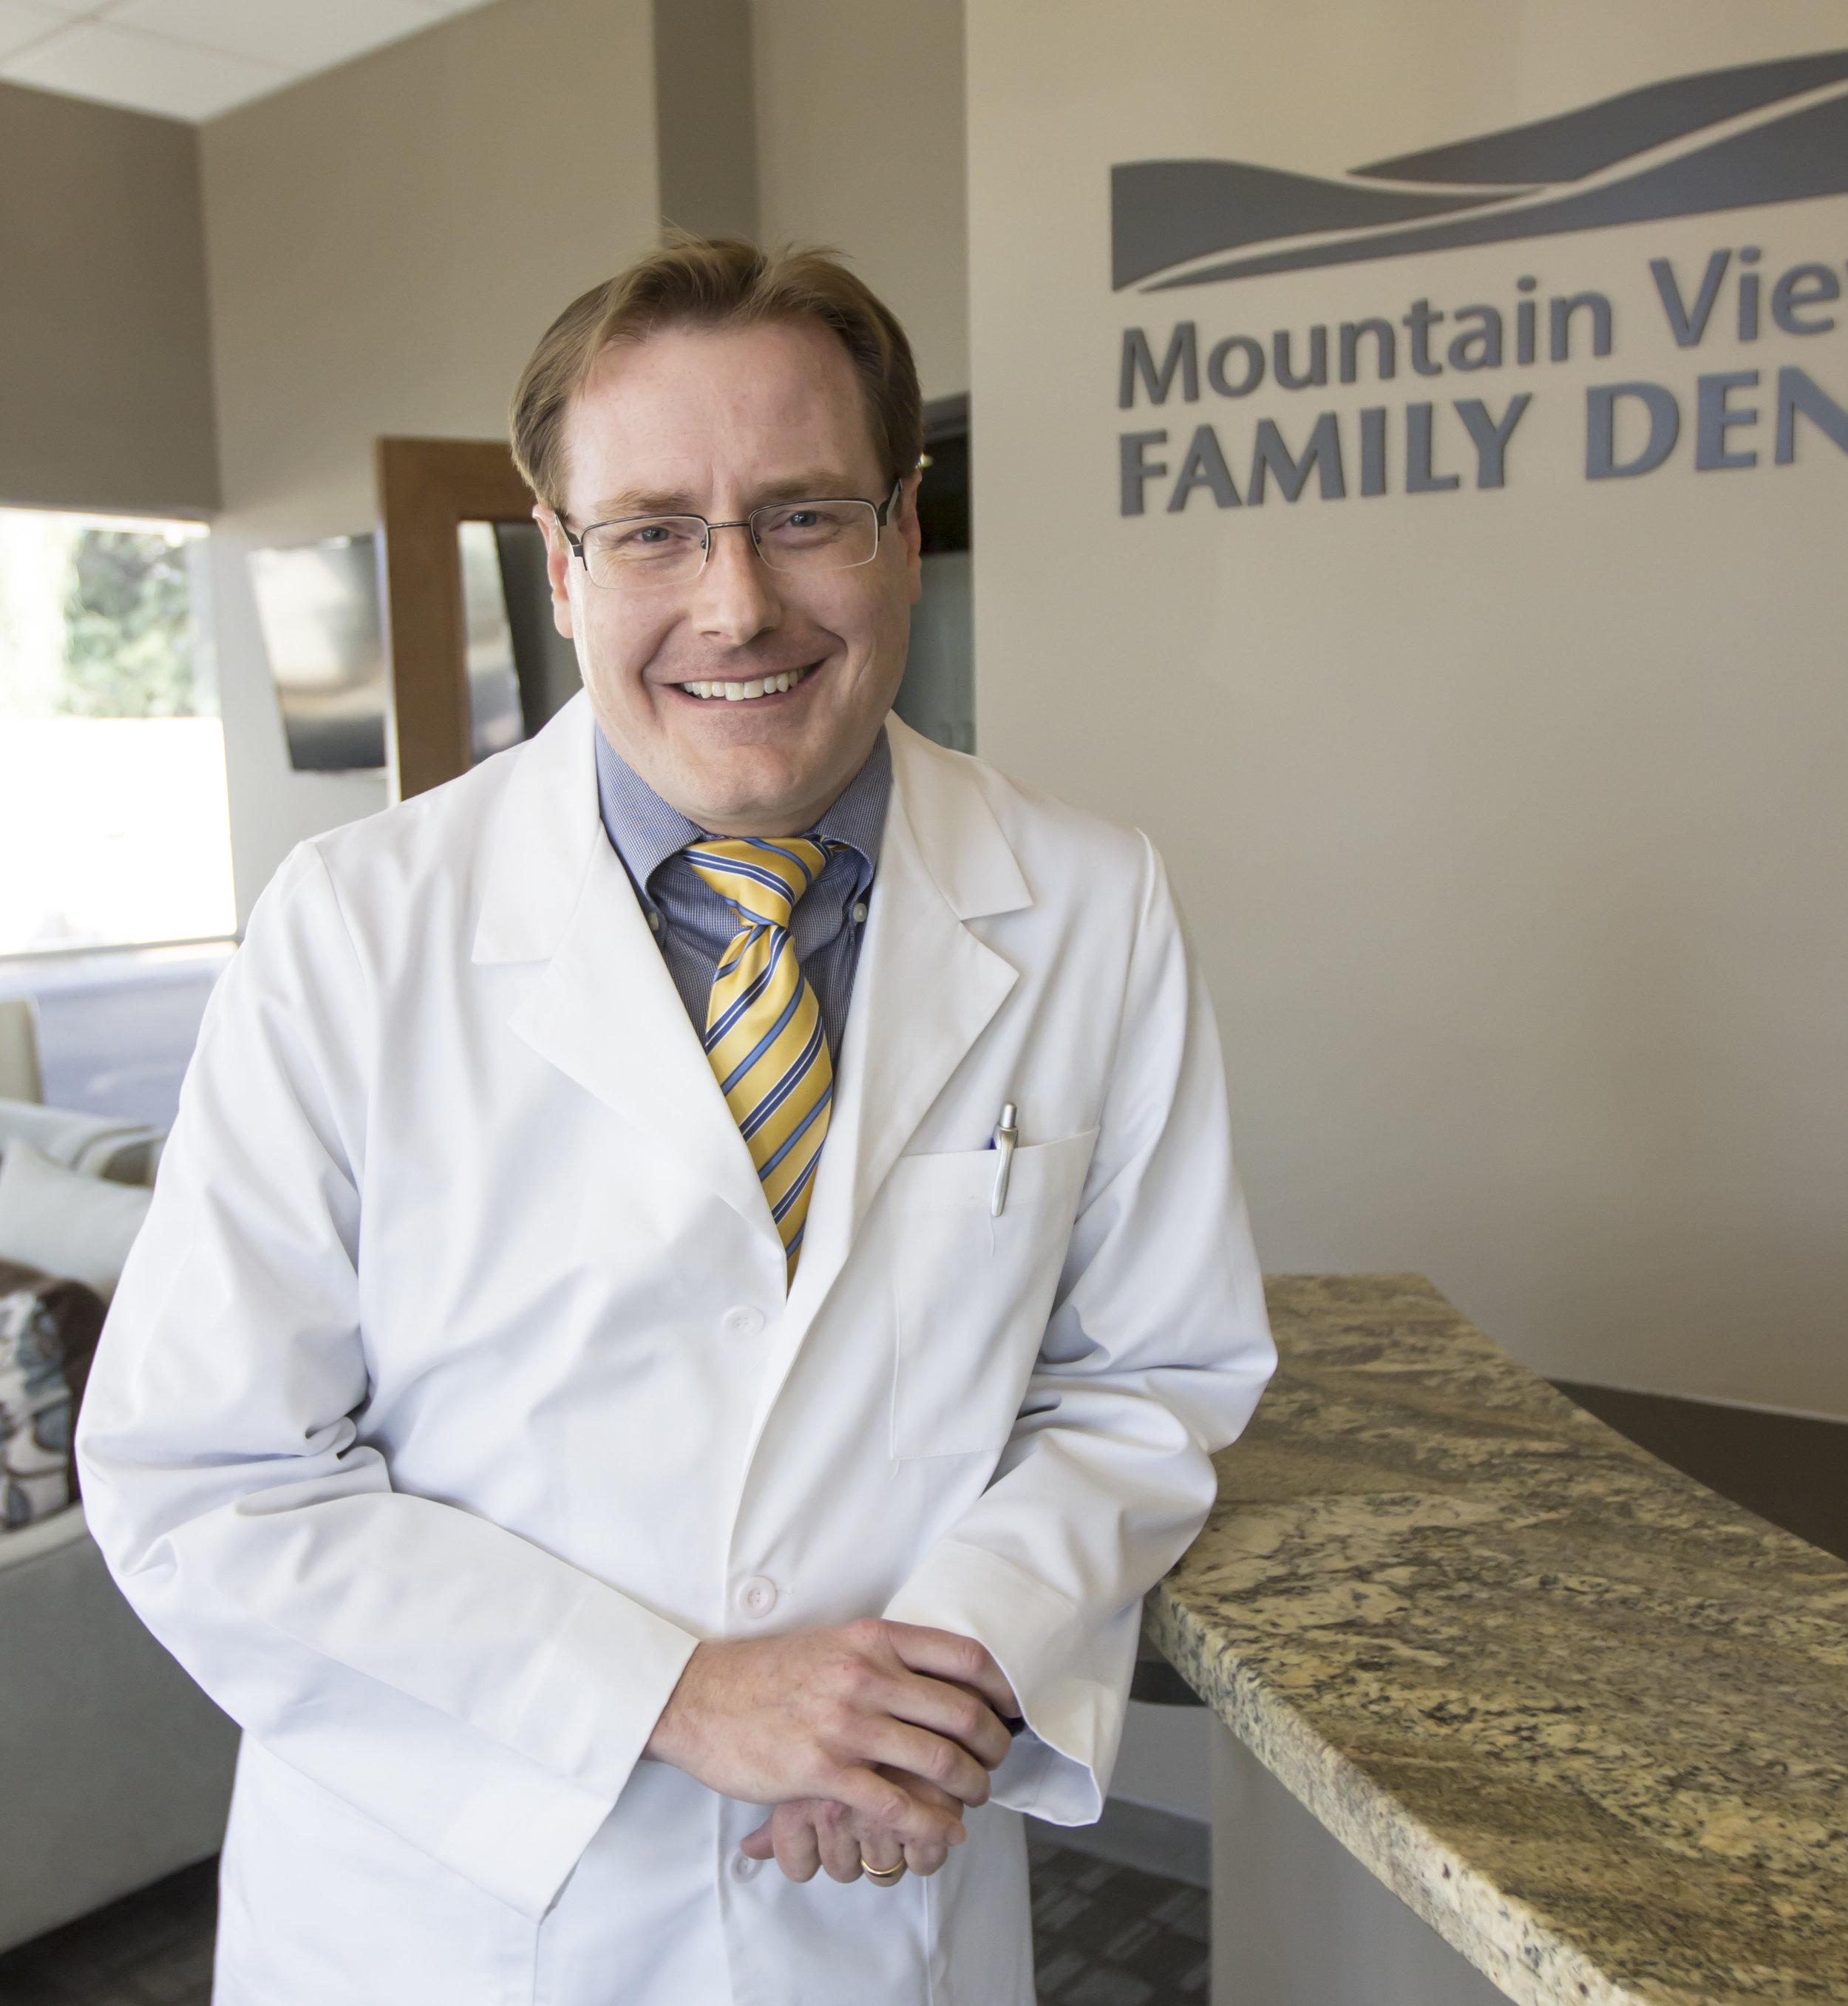 Meet Dr. Shayne Guffey at Mountain View Family Dental in Mesa, AZ.